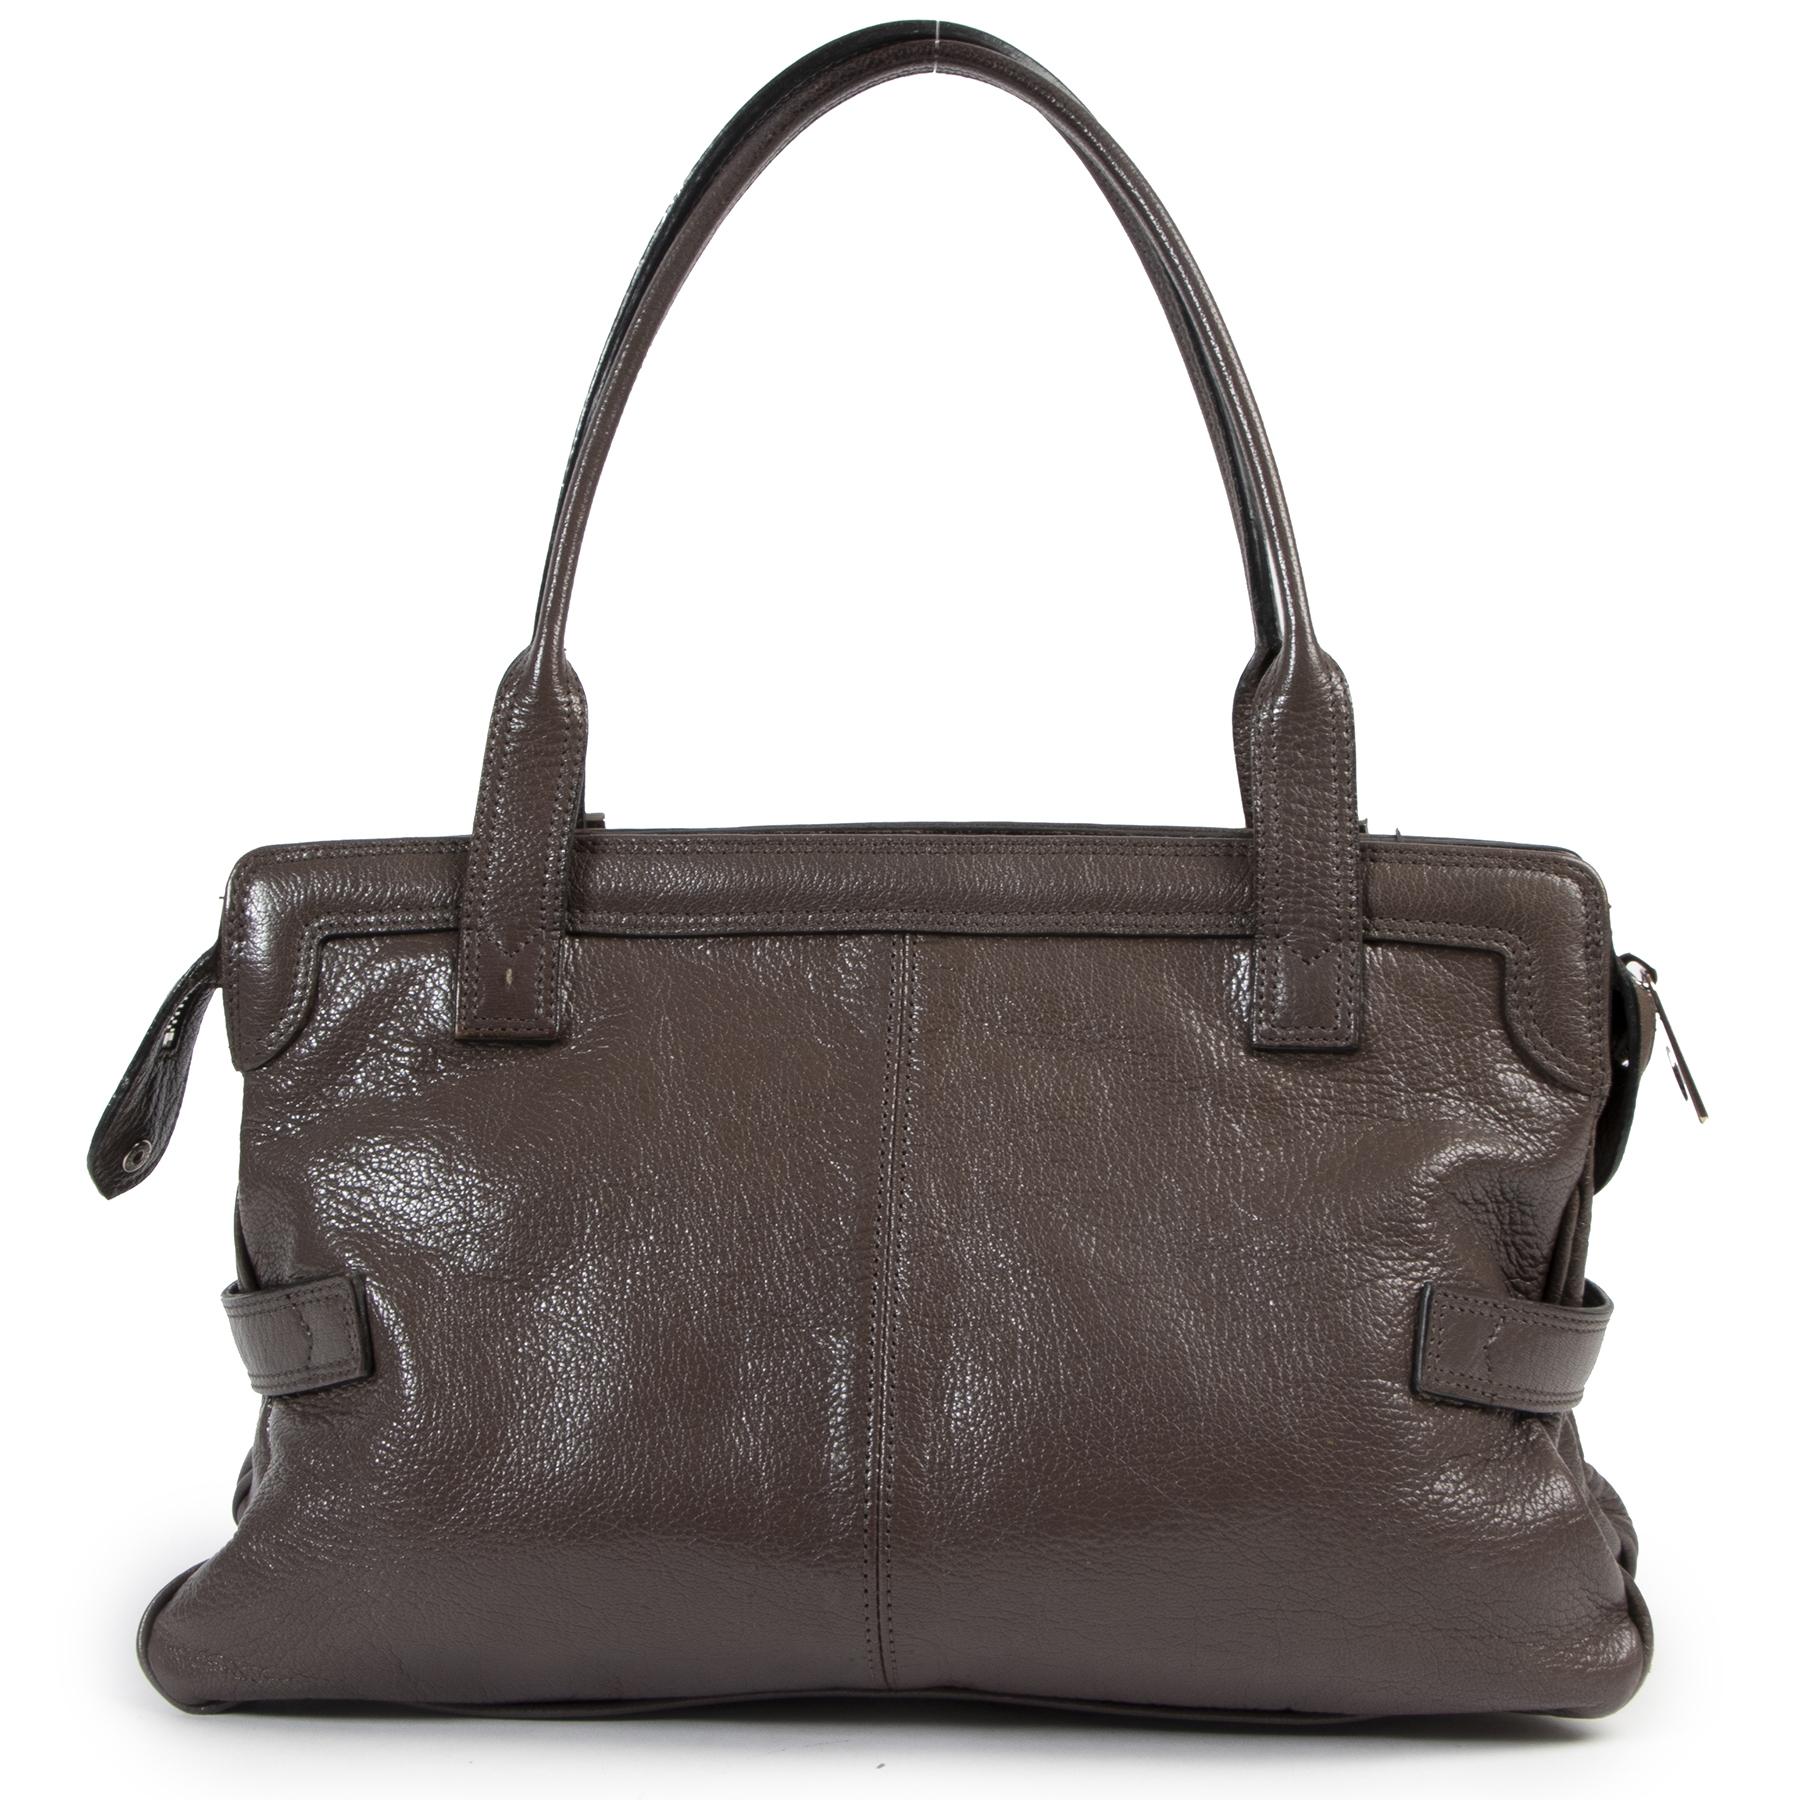 Authentic secondhand Mulberry Brown Leather Shoulder Bag designer bags fashion luxury vintage webshop safe secure online shopping